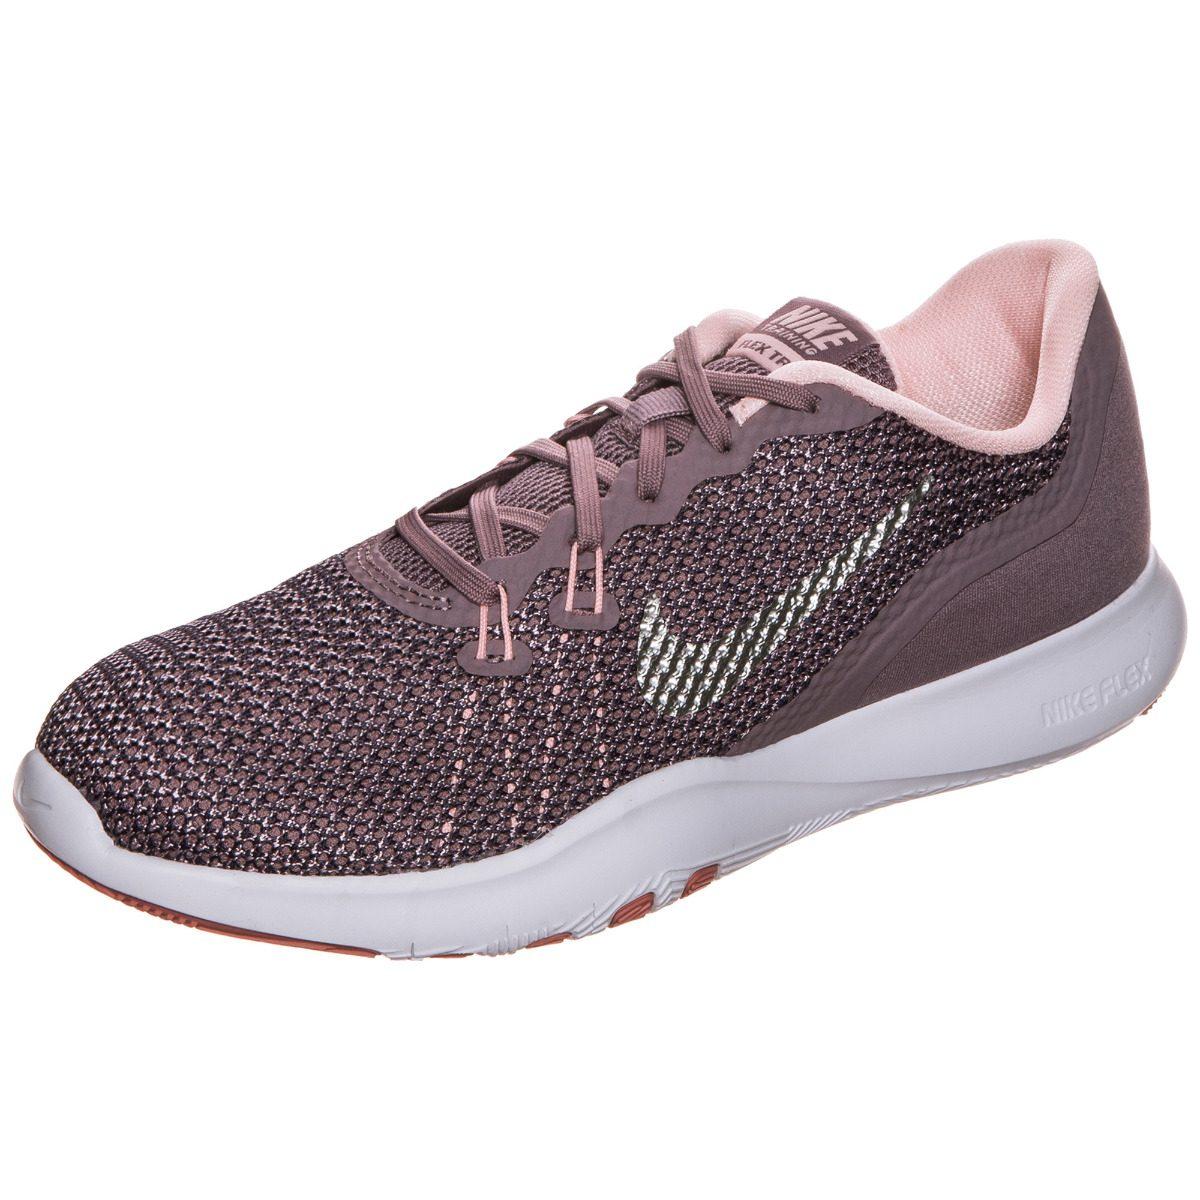 954702fff3507 ... get tenis w nike flex trainer gris rosa mujer 100 original. cargando  zoom. e628f